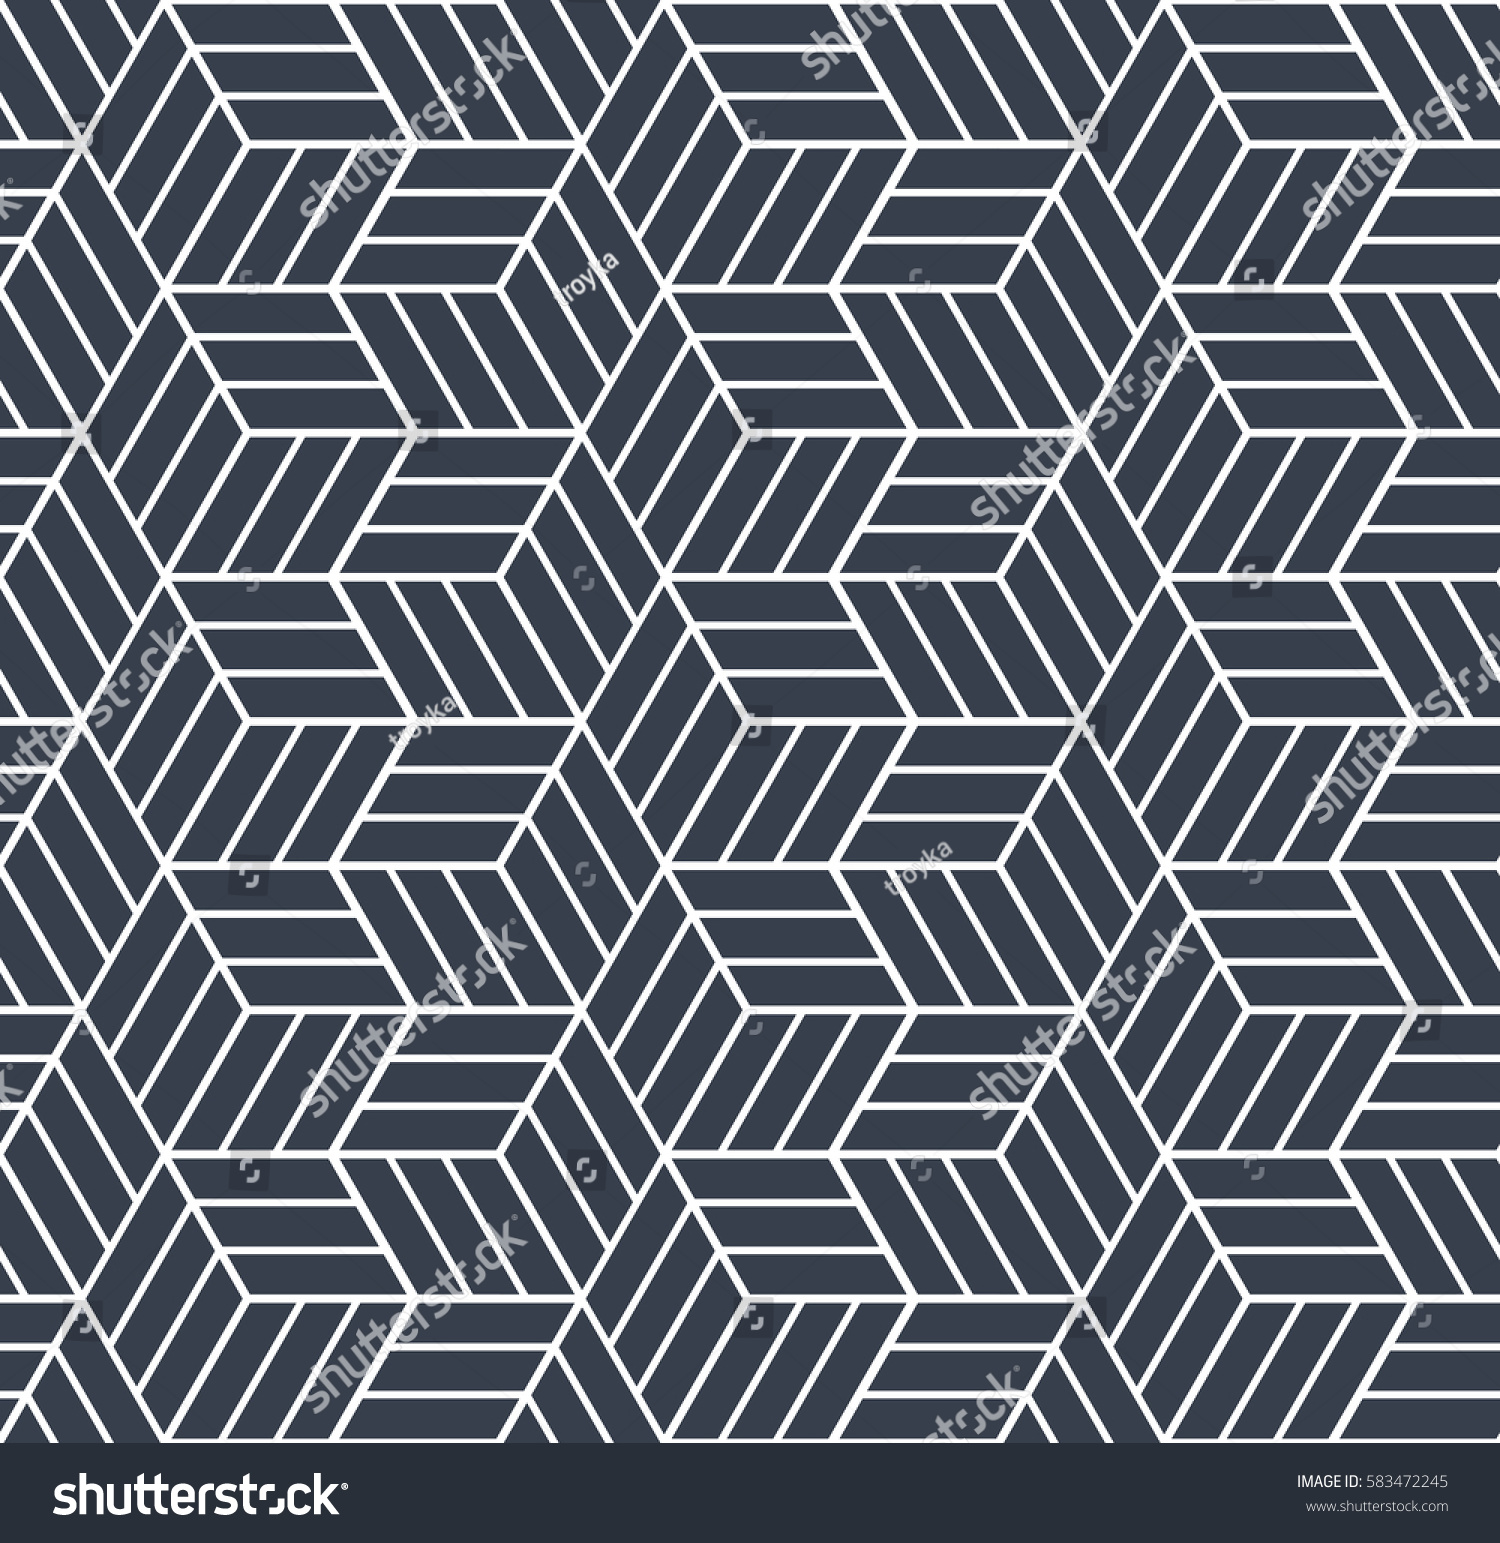 Seamless op art pattern 3d illusion stock vector 583472245 for Geometric illusion art